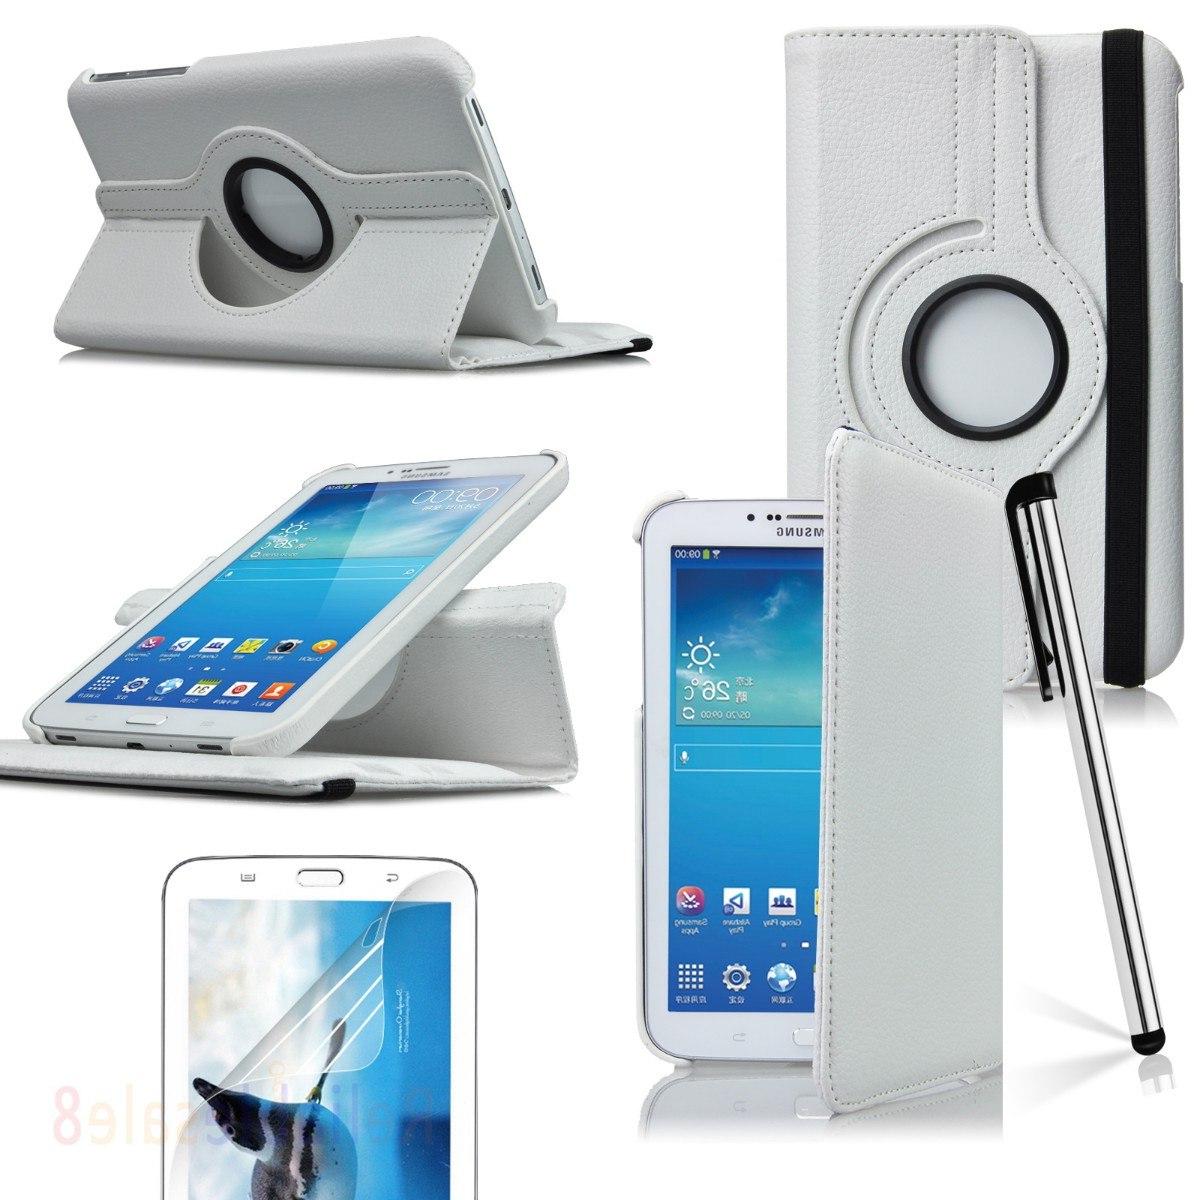 Accesorios Tablet Samsung Budm Funda Giratoria 360Â Samsung Galaxy Tab 3 7 0 P3200 P3210 149 00